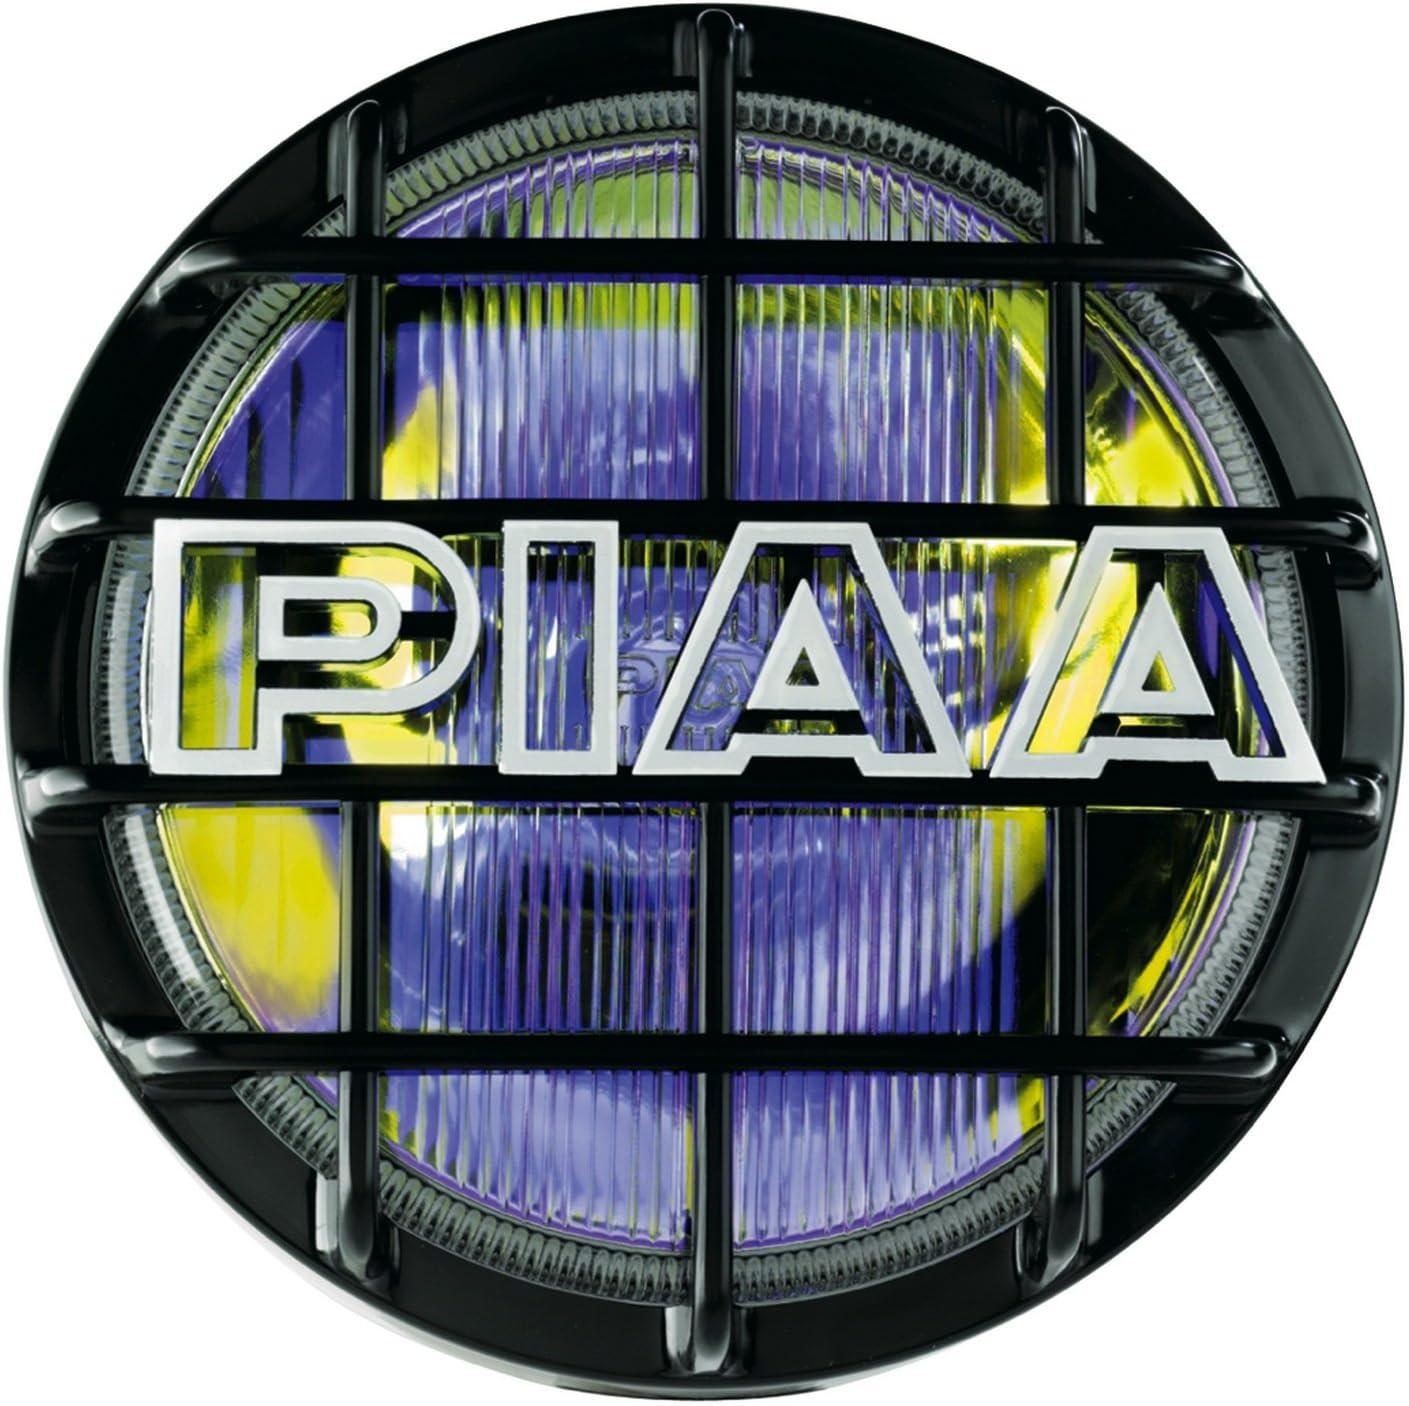 B000182E28 PIAA 5293 520 Series Ion Crystal Black Driving Lamp - Set of 2 81QLCt5au1L.SL1500_